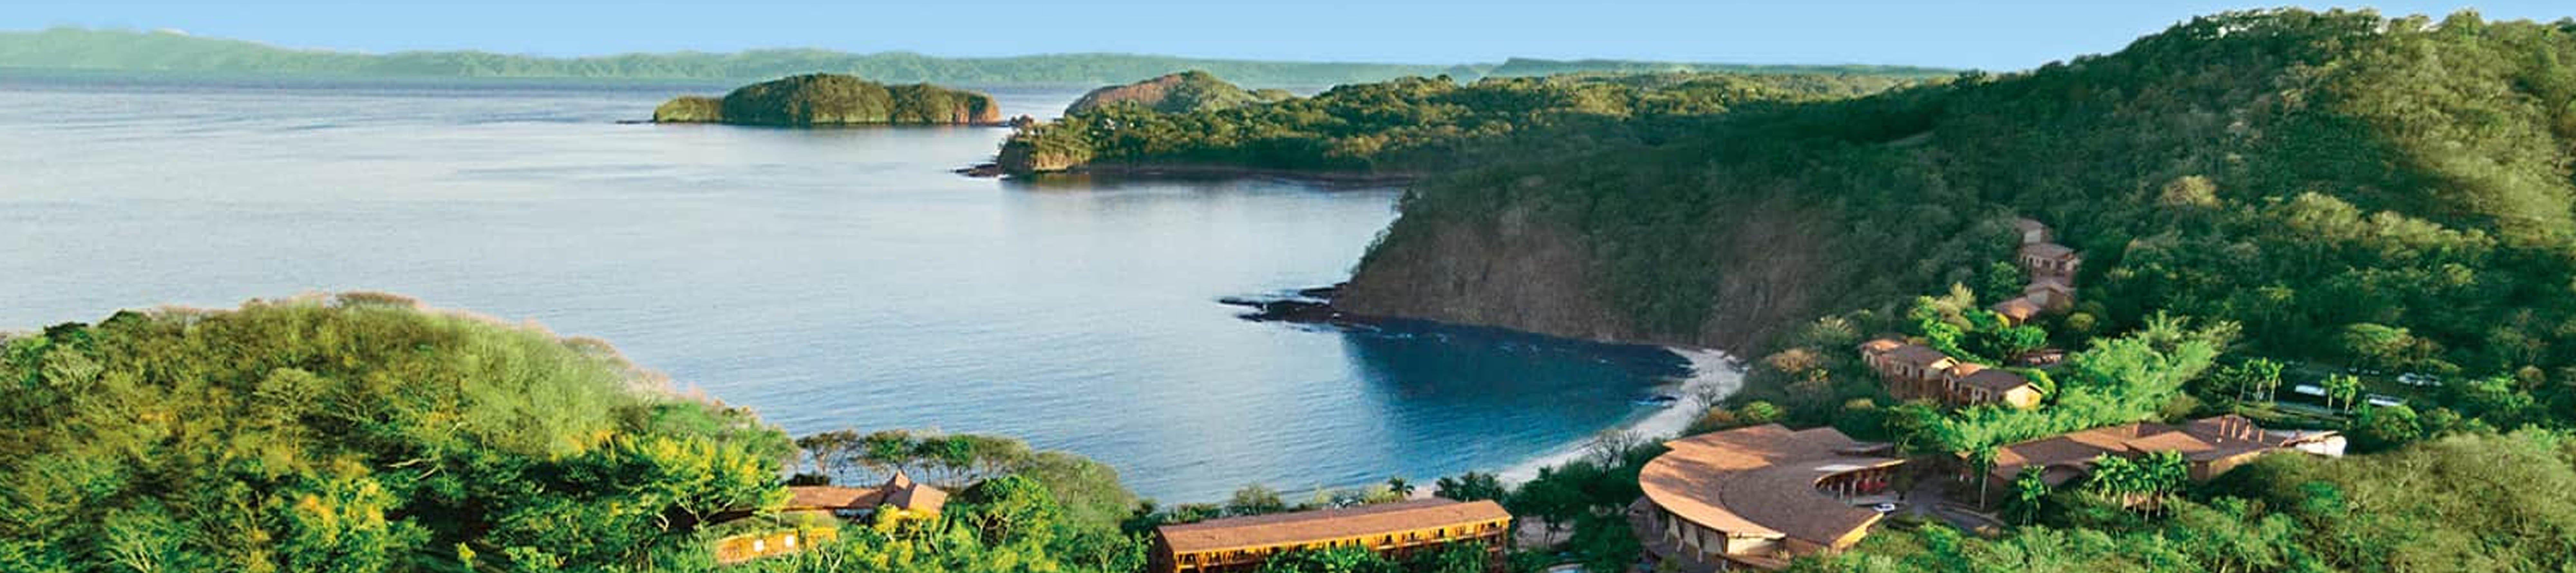 Costa Rica-Four Seasons